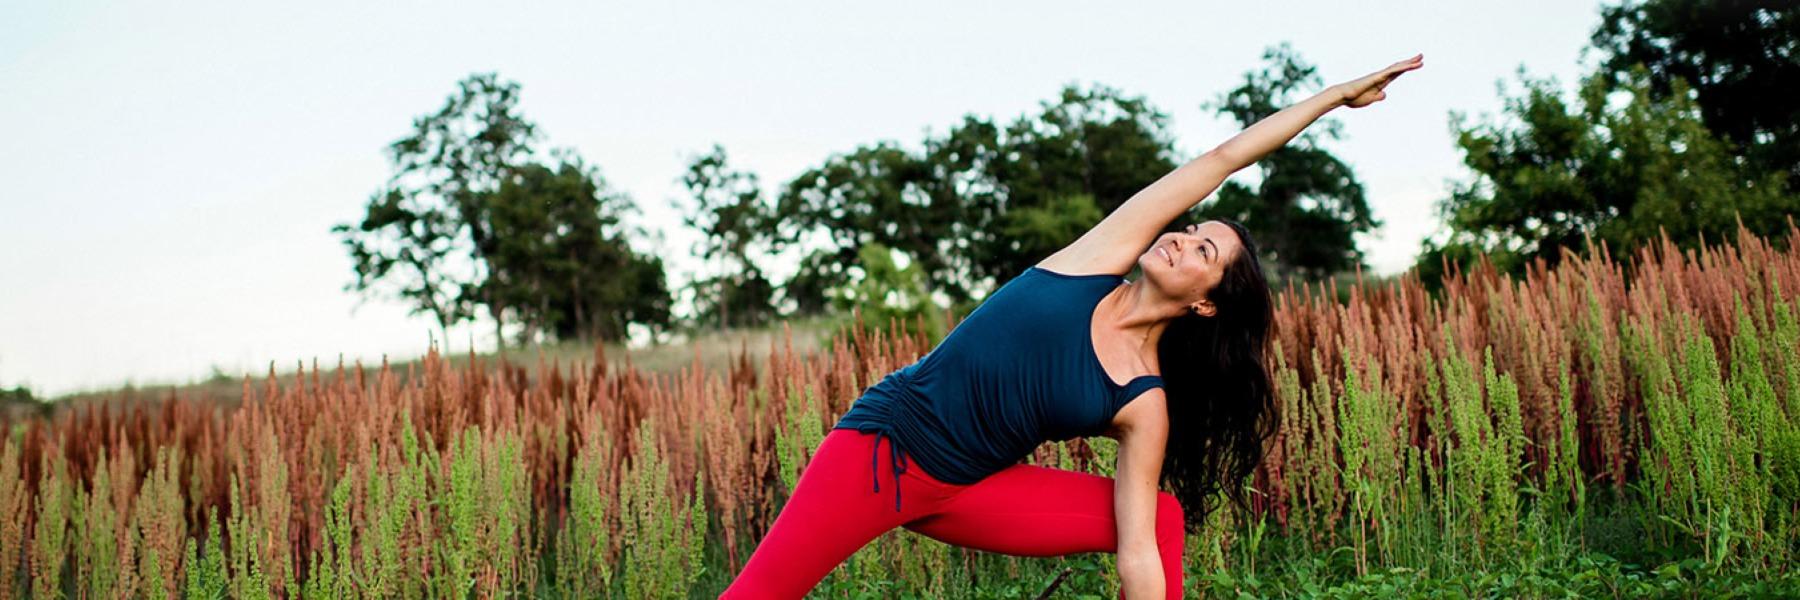 Yoga and Ayurveda Connection | Banyan Botanicals